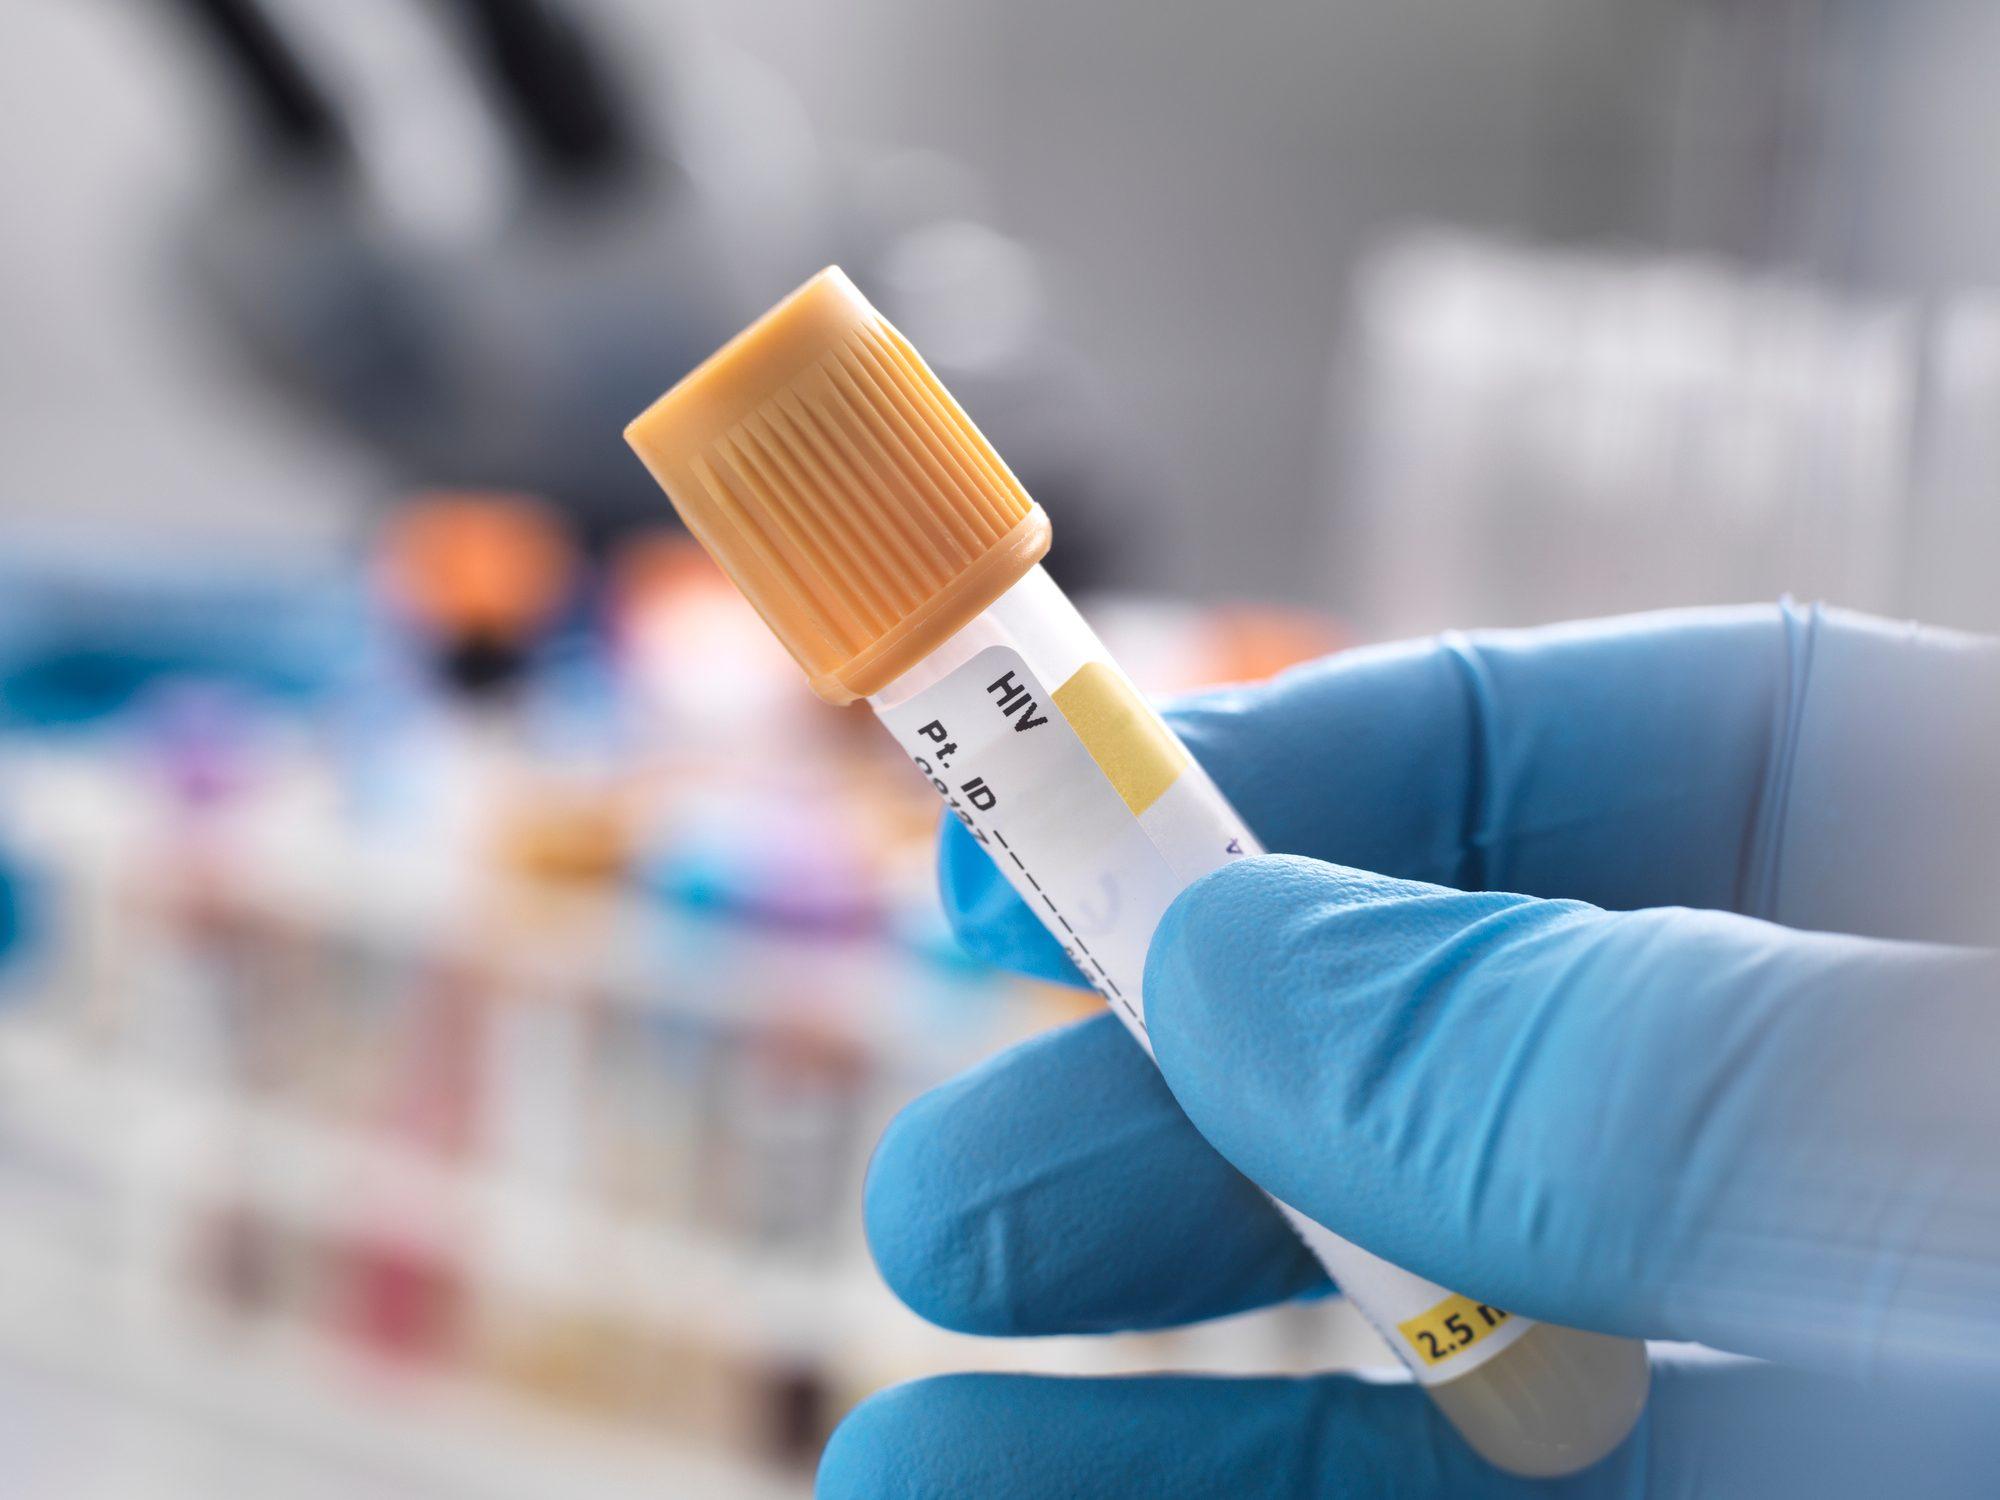 Medical technician preparing a sample for HIV testing